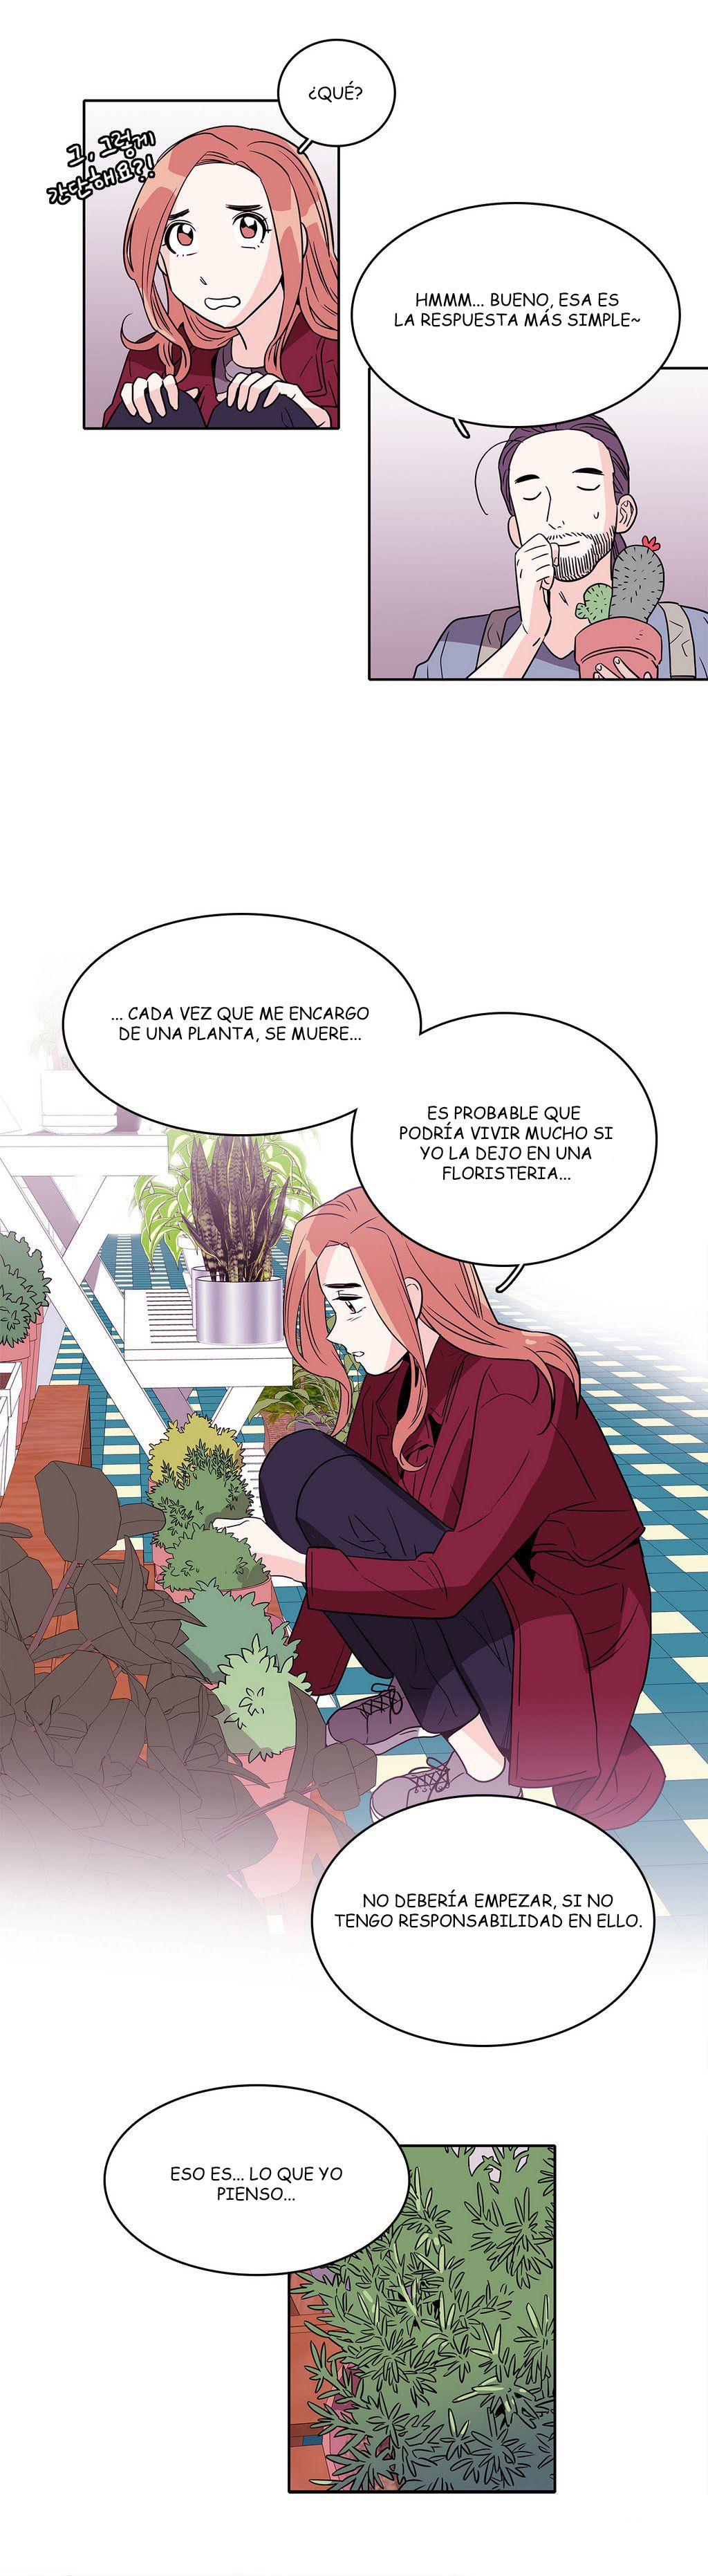 http://c5.ninemanga.com/es_manga/51/19443/461875/978362ce7b096266e2cefb878aa3250b.jpg Page 5